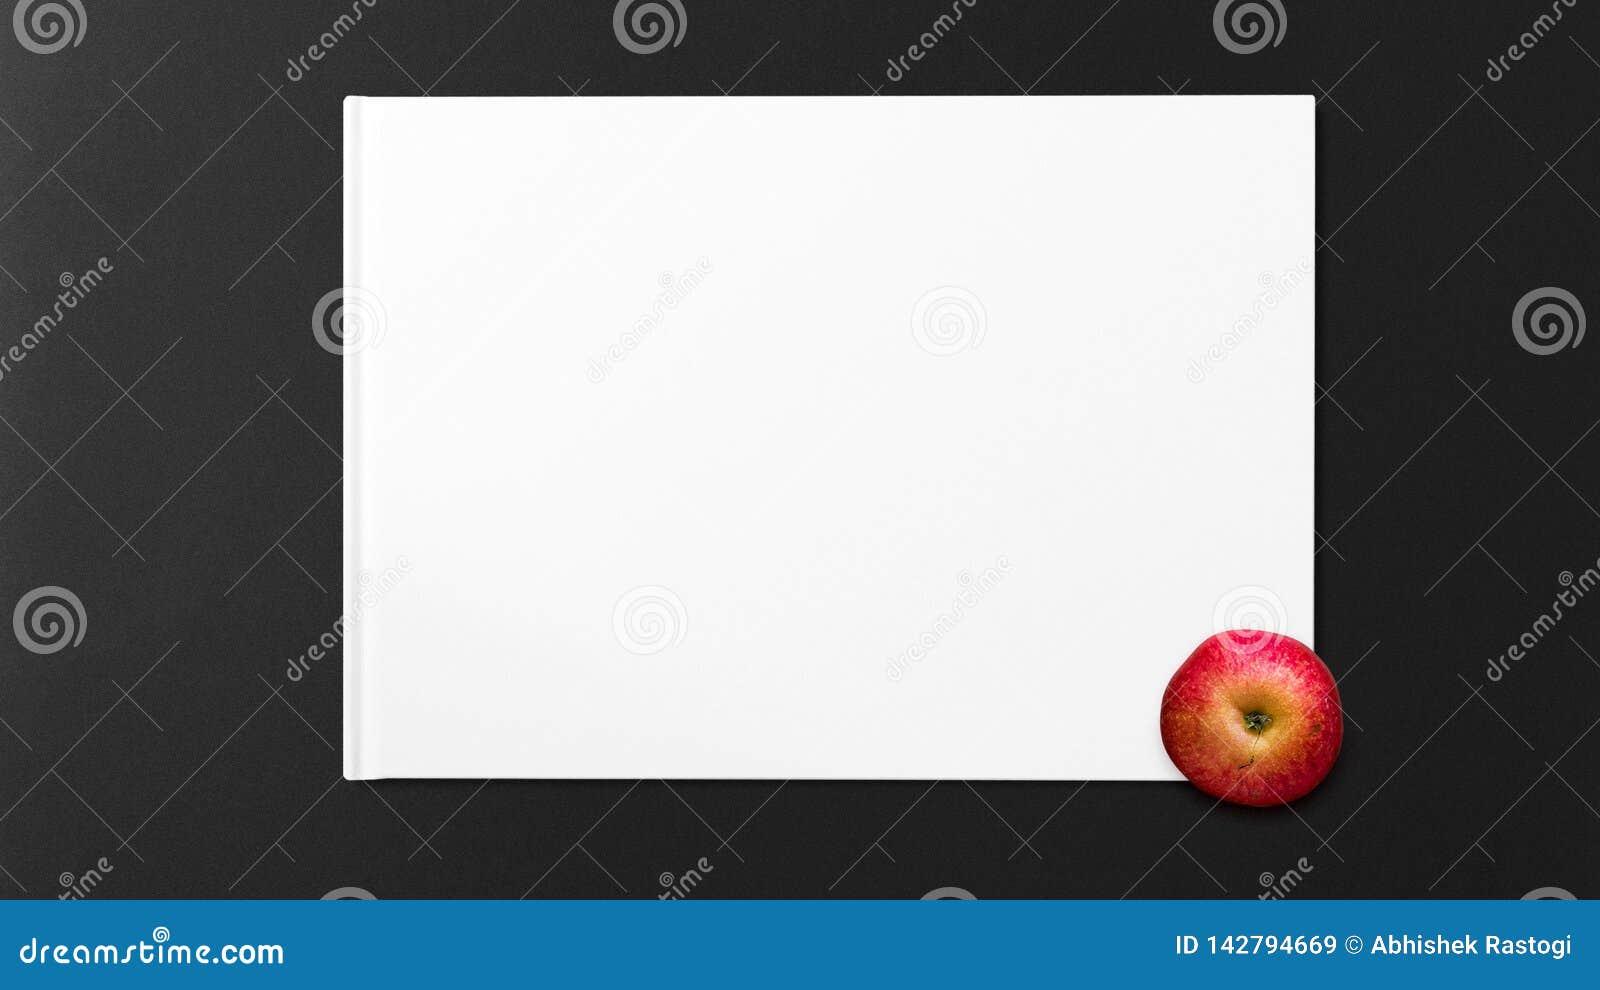 Red Apple on white paper on dark background